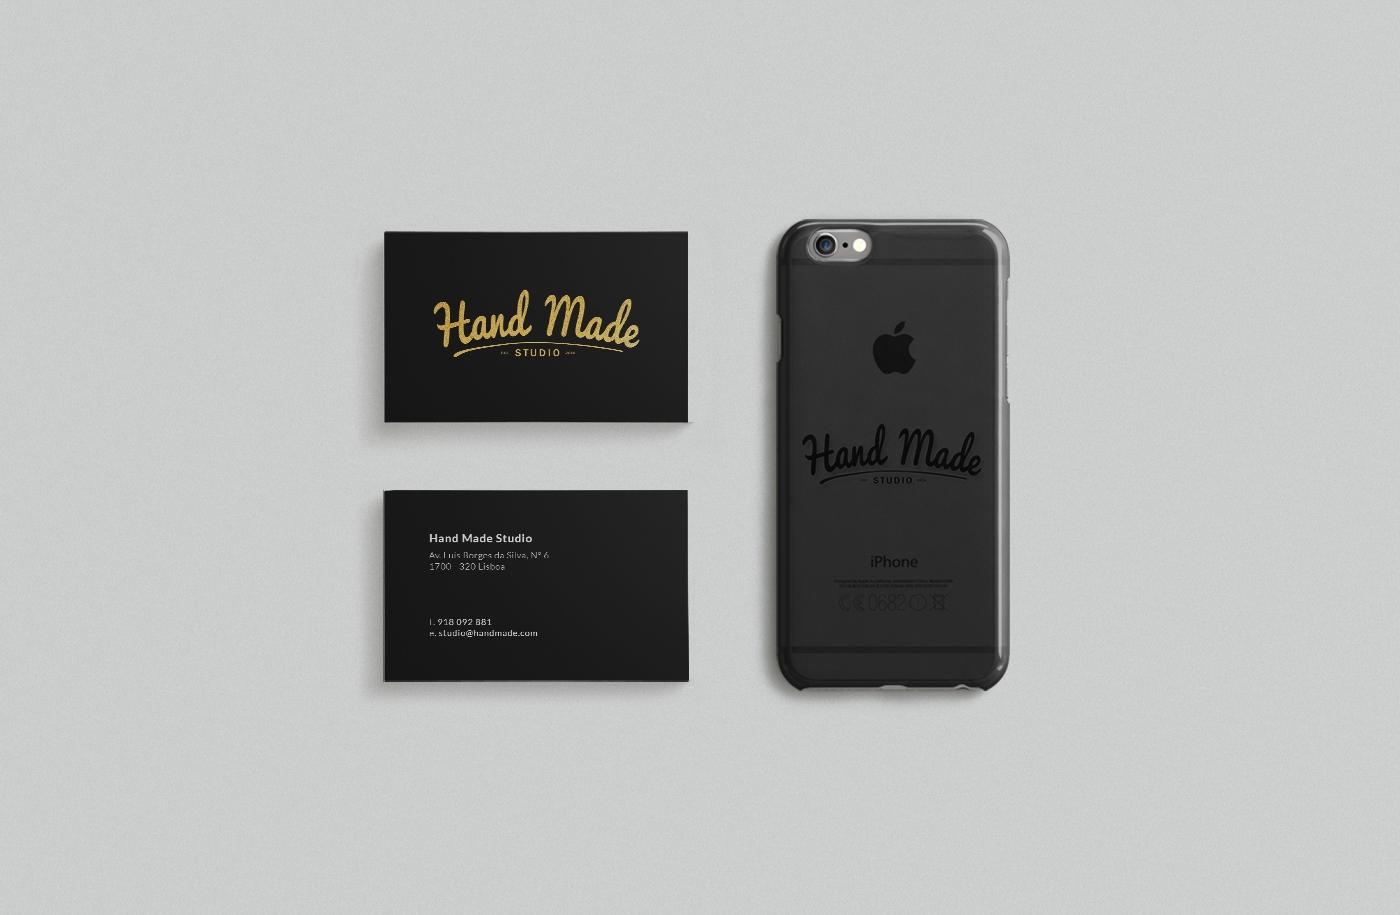 Branding for hand made studio a graphic design studio